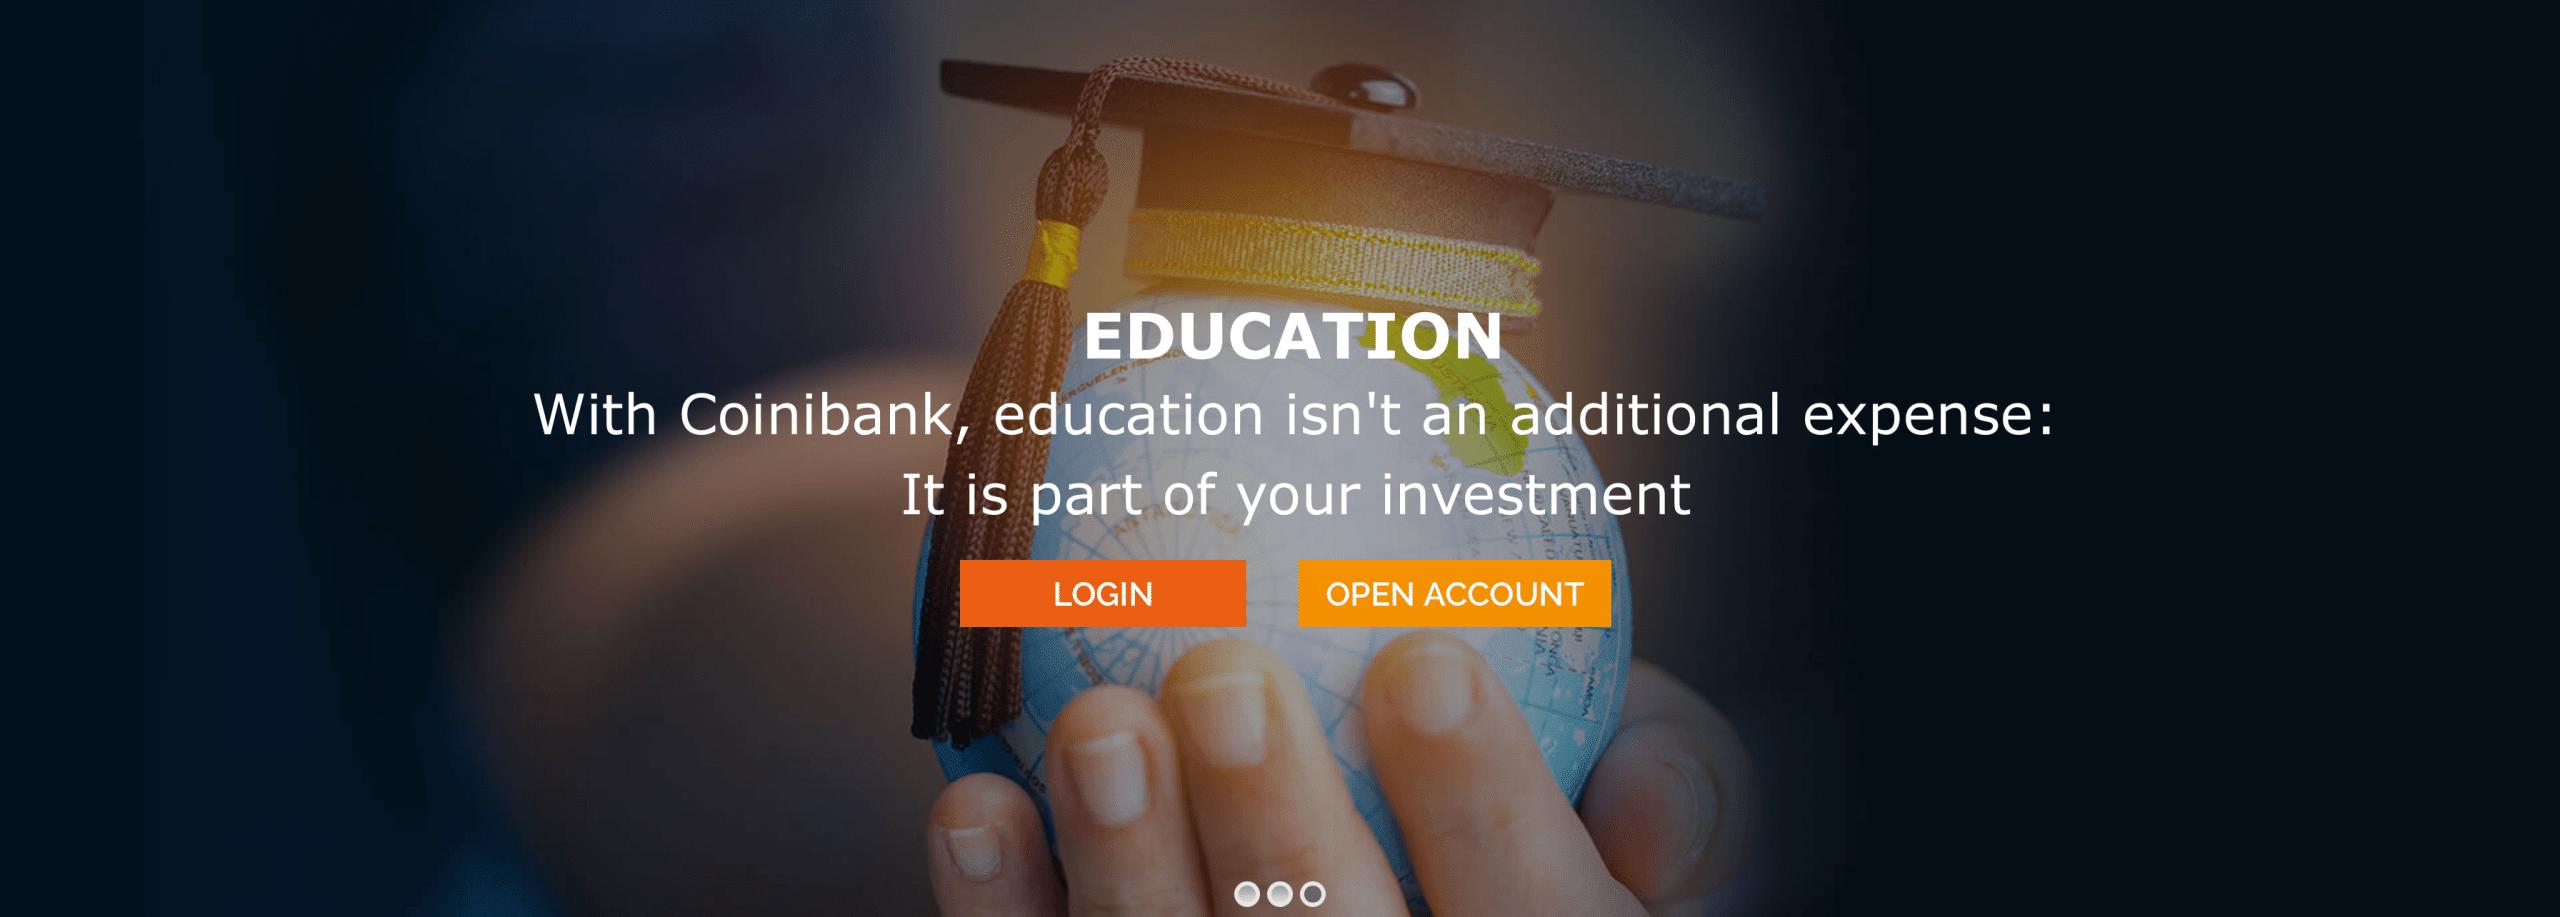 Coinibank Education Header